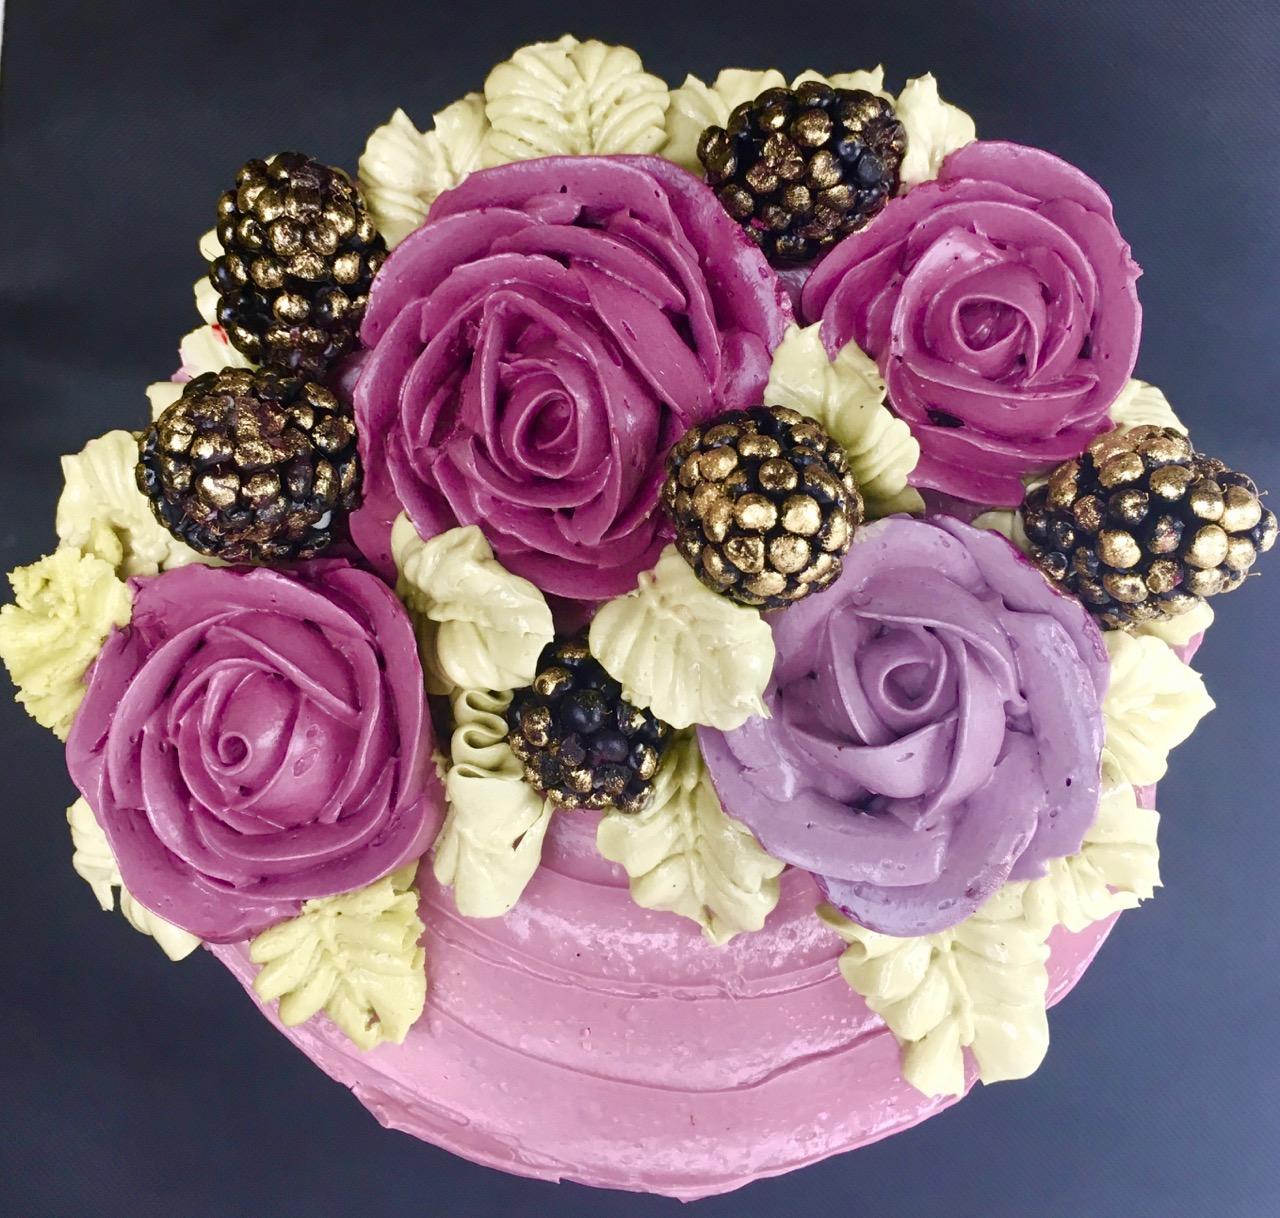 Buttercream flowers with blackberries ca